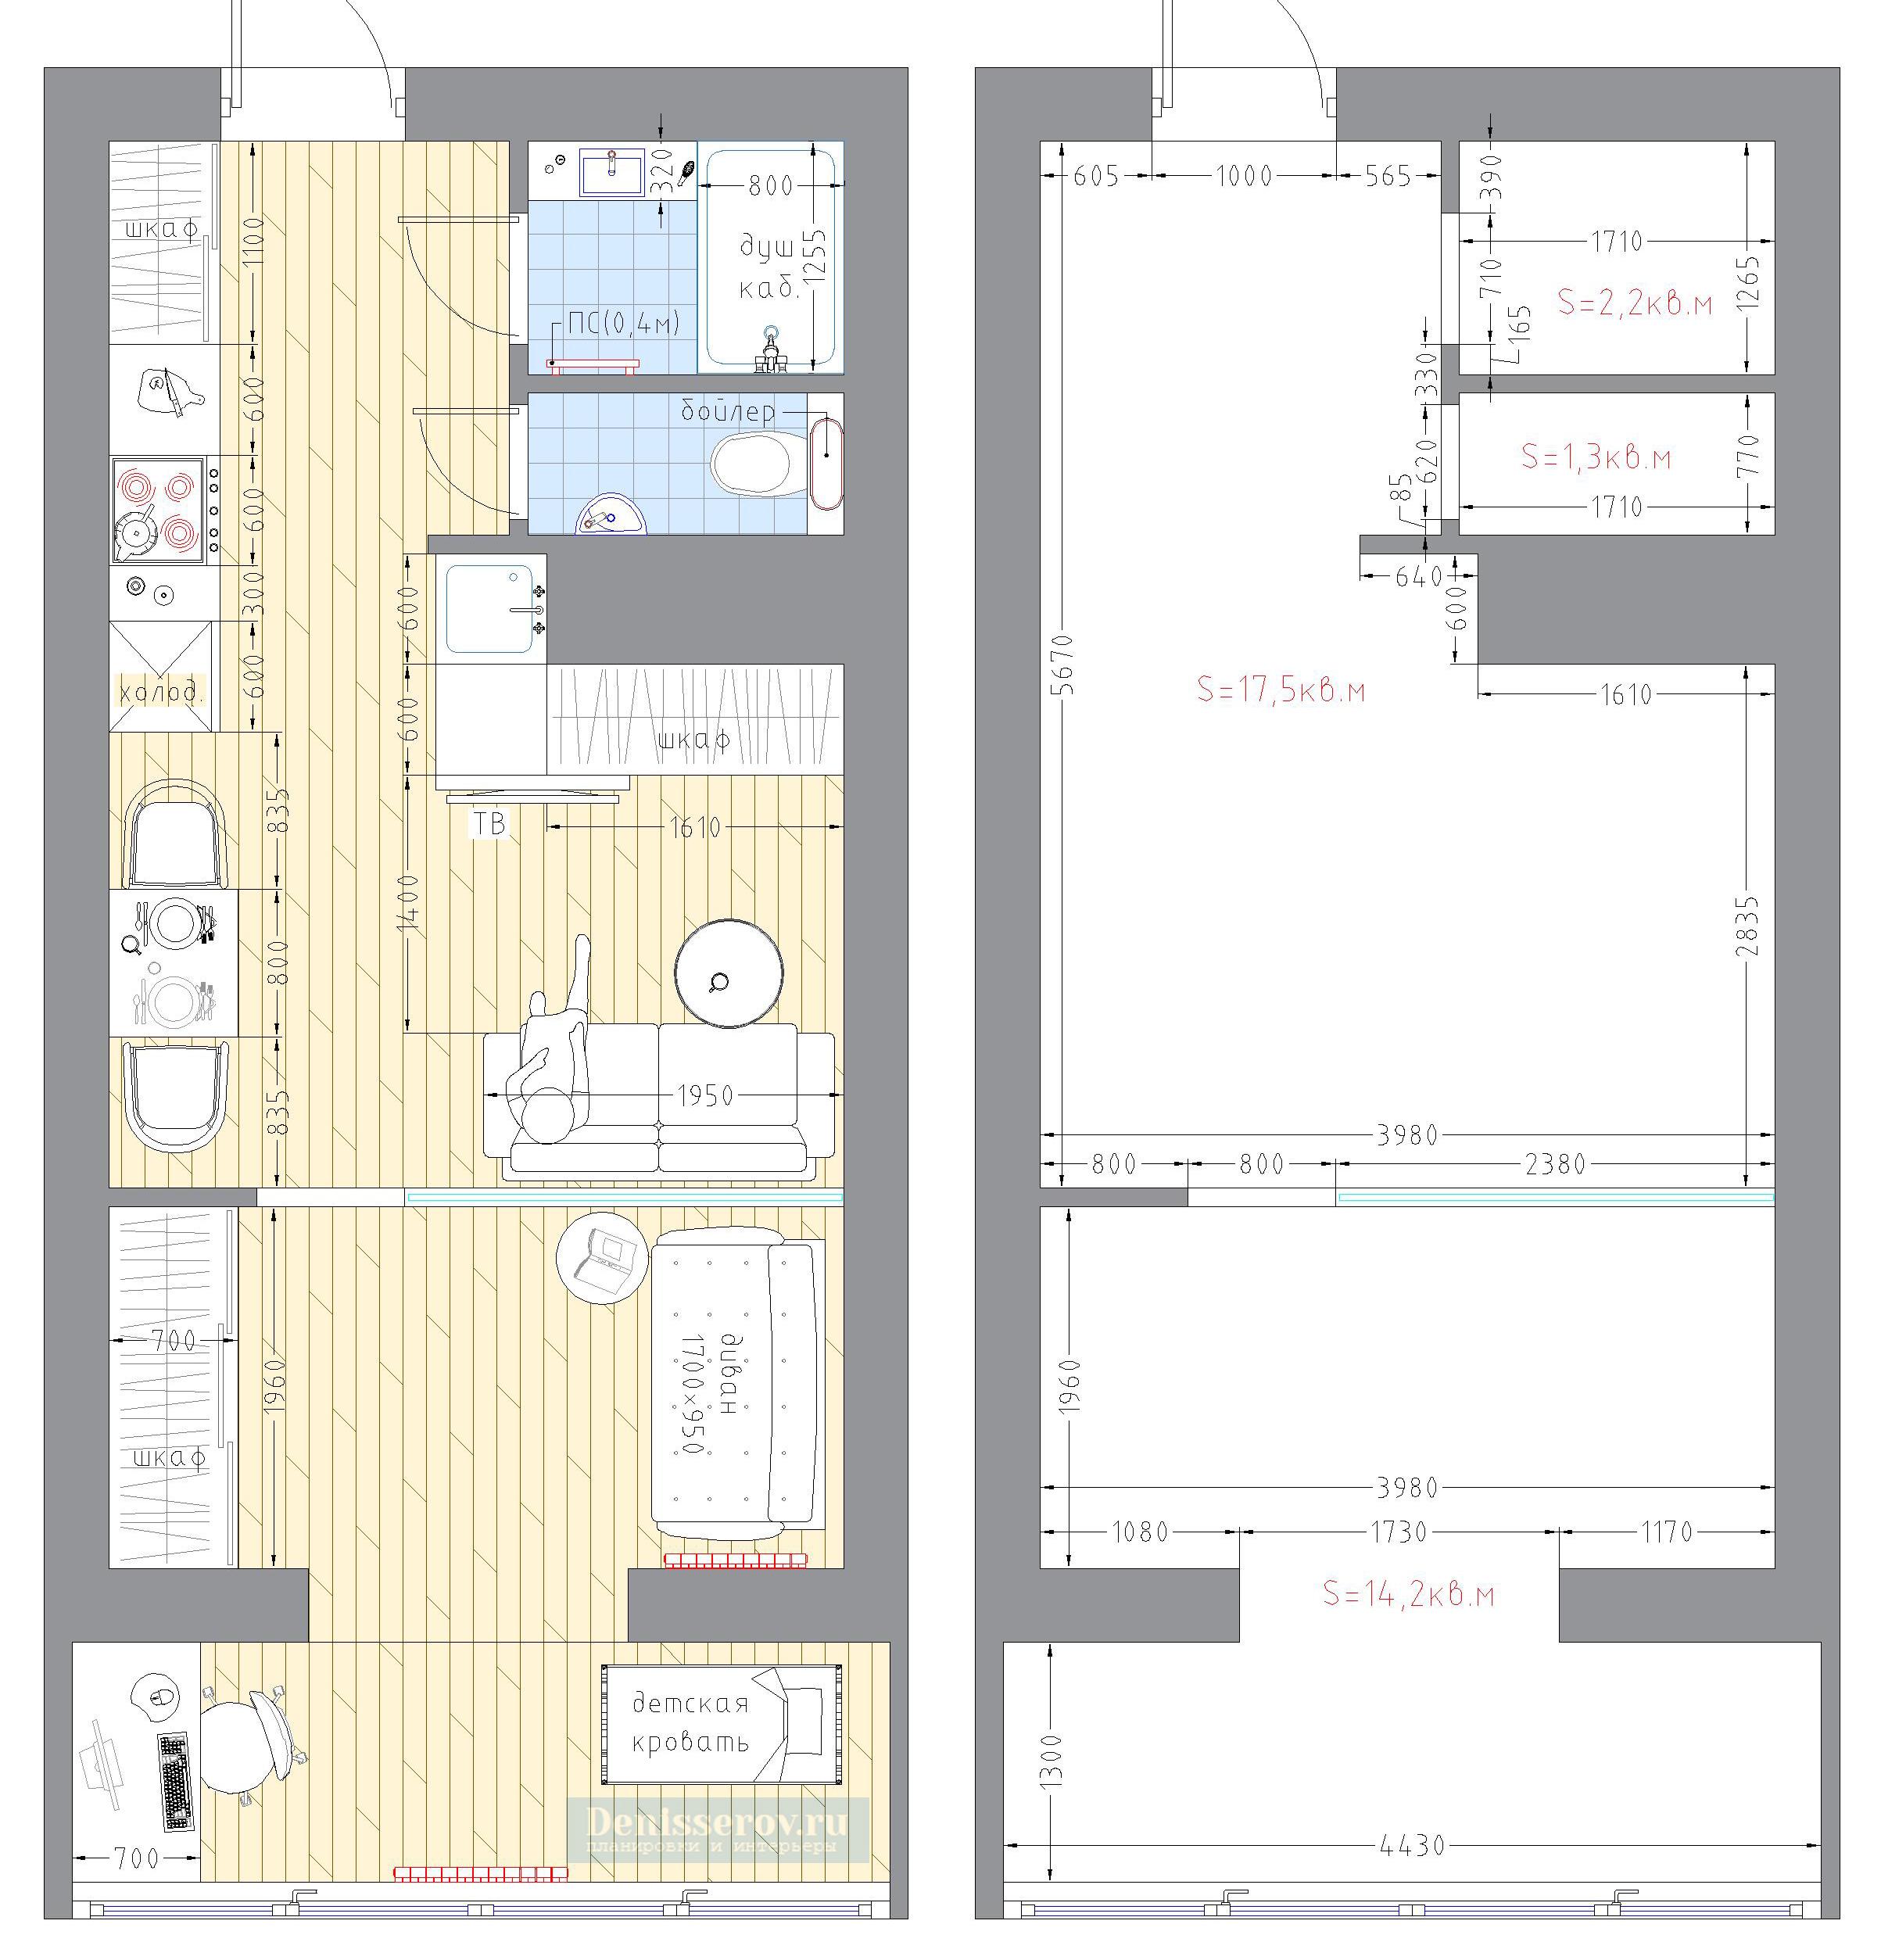 Дизайн проект для квартиры 65 м2 с небольшим бюджетом on